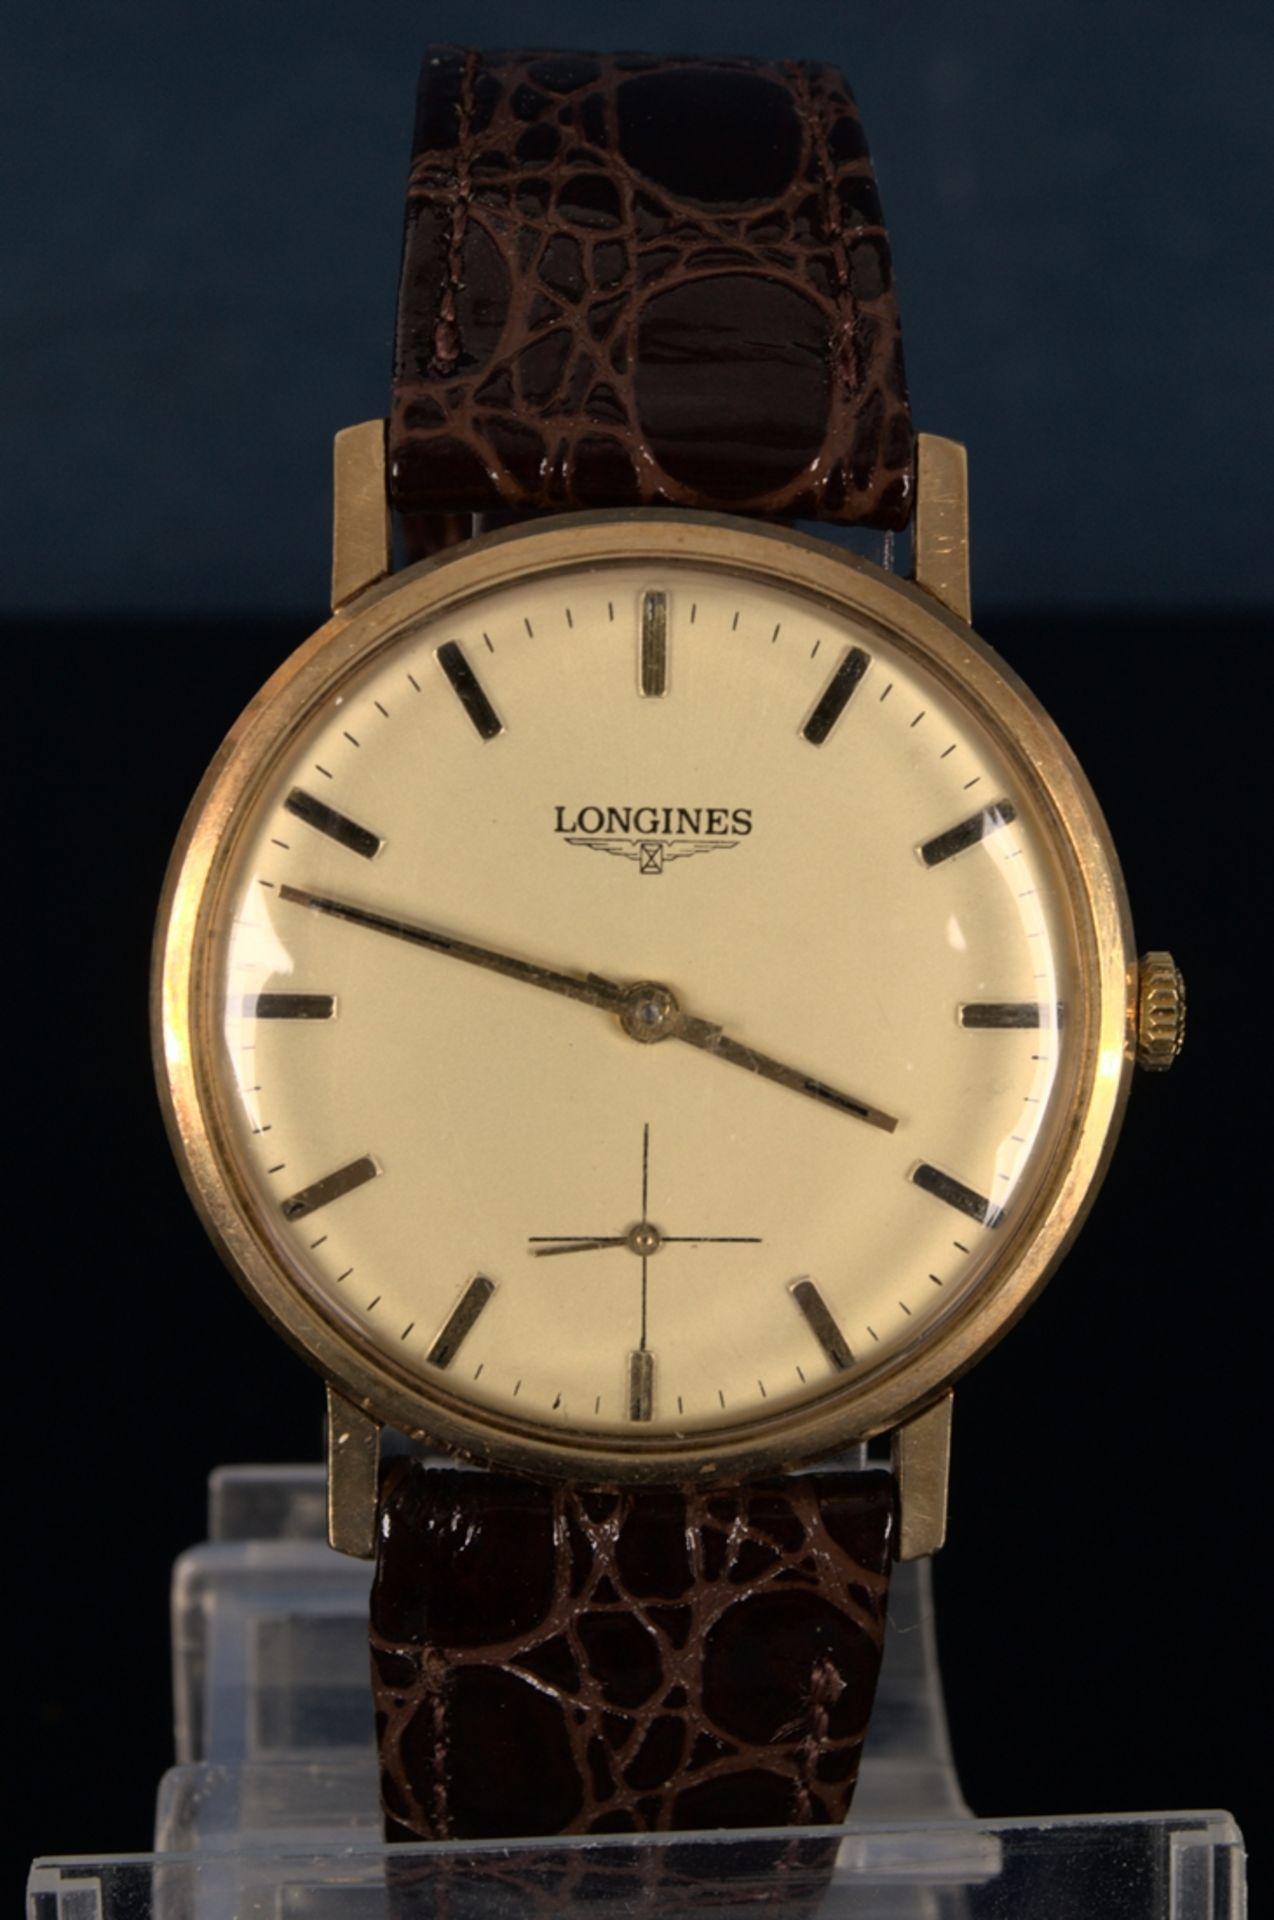 """LONGINES"" - Elegante, goldene Herrenarmbanduhr der Marke Longines. Gehäuse in 18 K Gelbgold,"